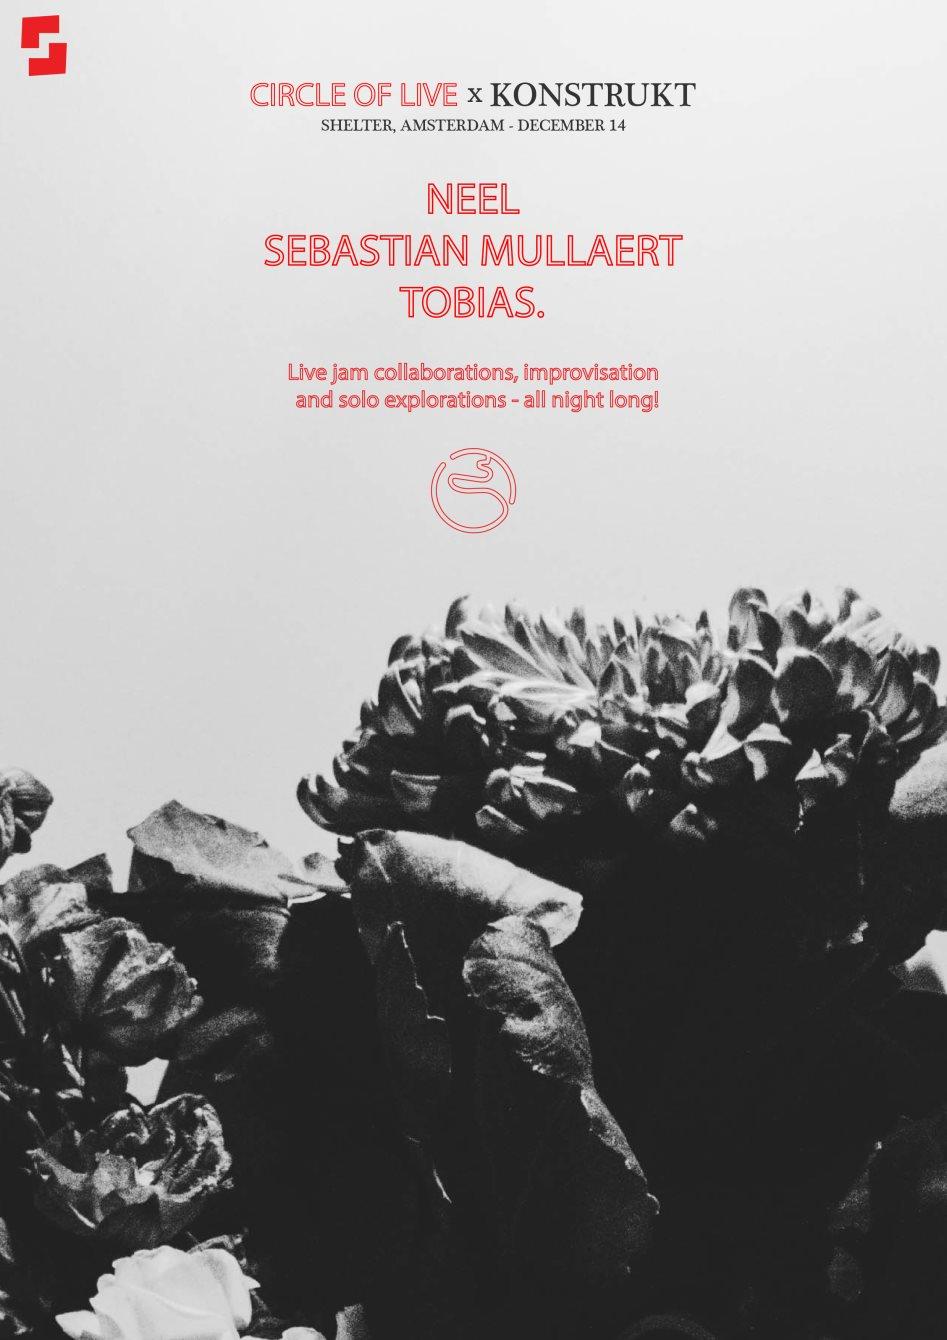 Shelter x Konstrukt x Circle Of Live with Sebastian Mullaert, Neel, Tobias  at Shelter in Amsterdam 14 Dec 2018